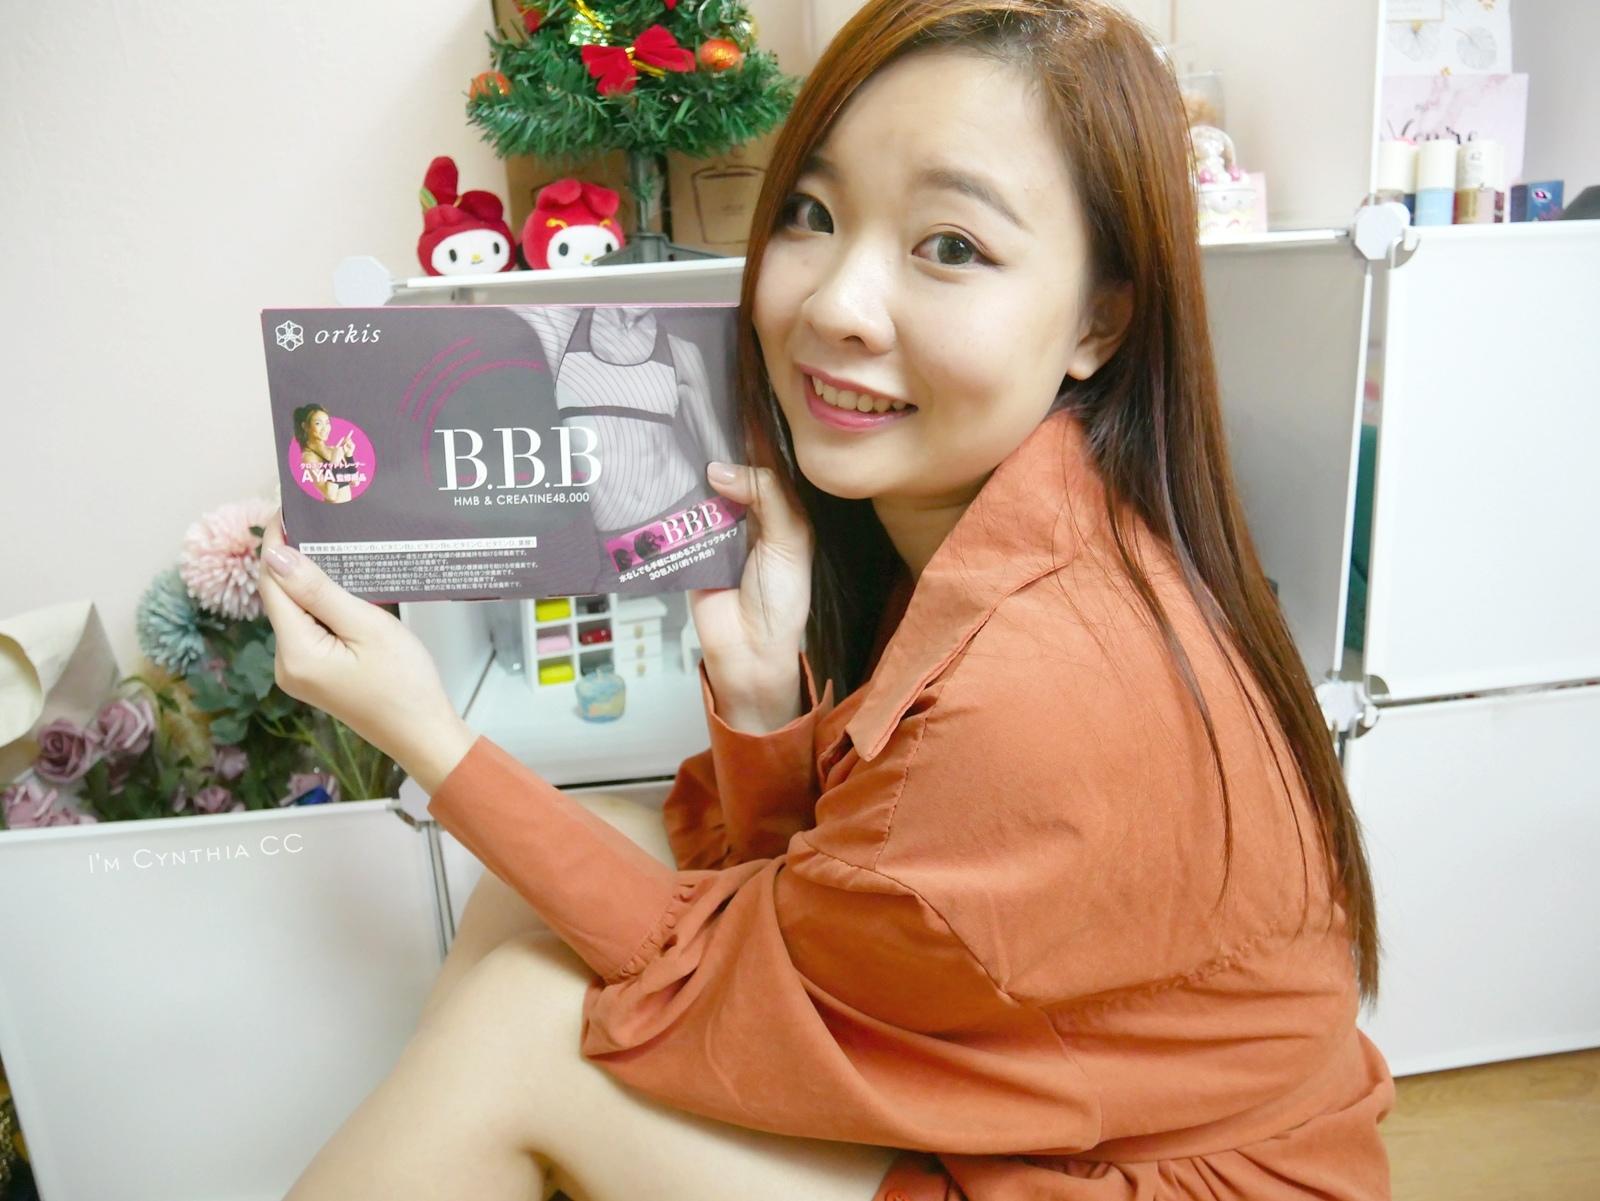 orkis BBB極致美體-日本直送營養機能食品 美容美體成份一次補充